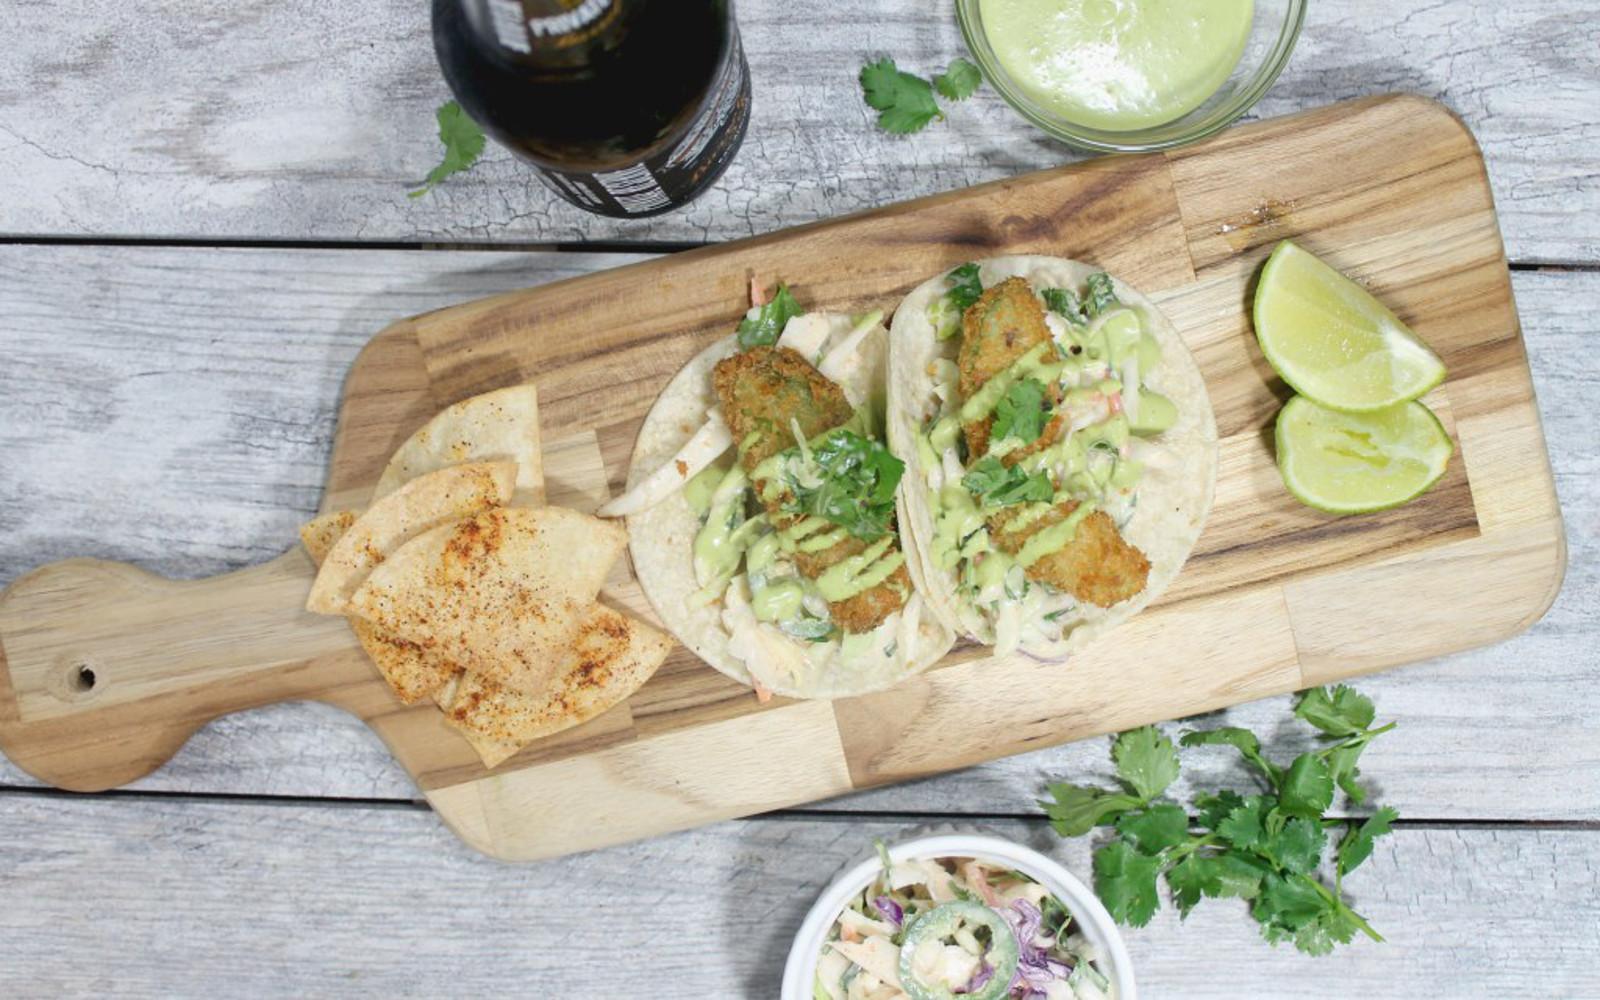 Fried Avocado Tacos With Jalapeno Slaw